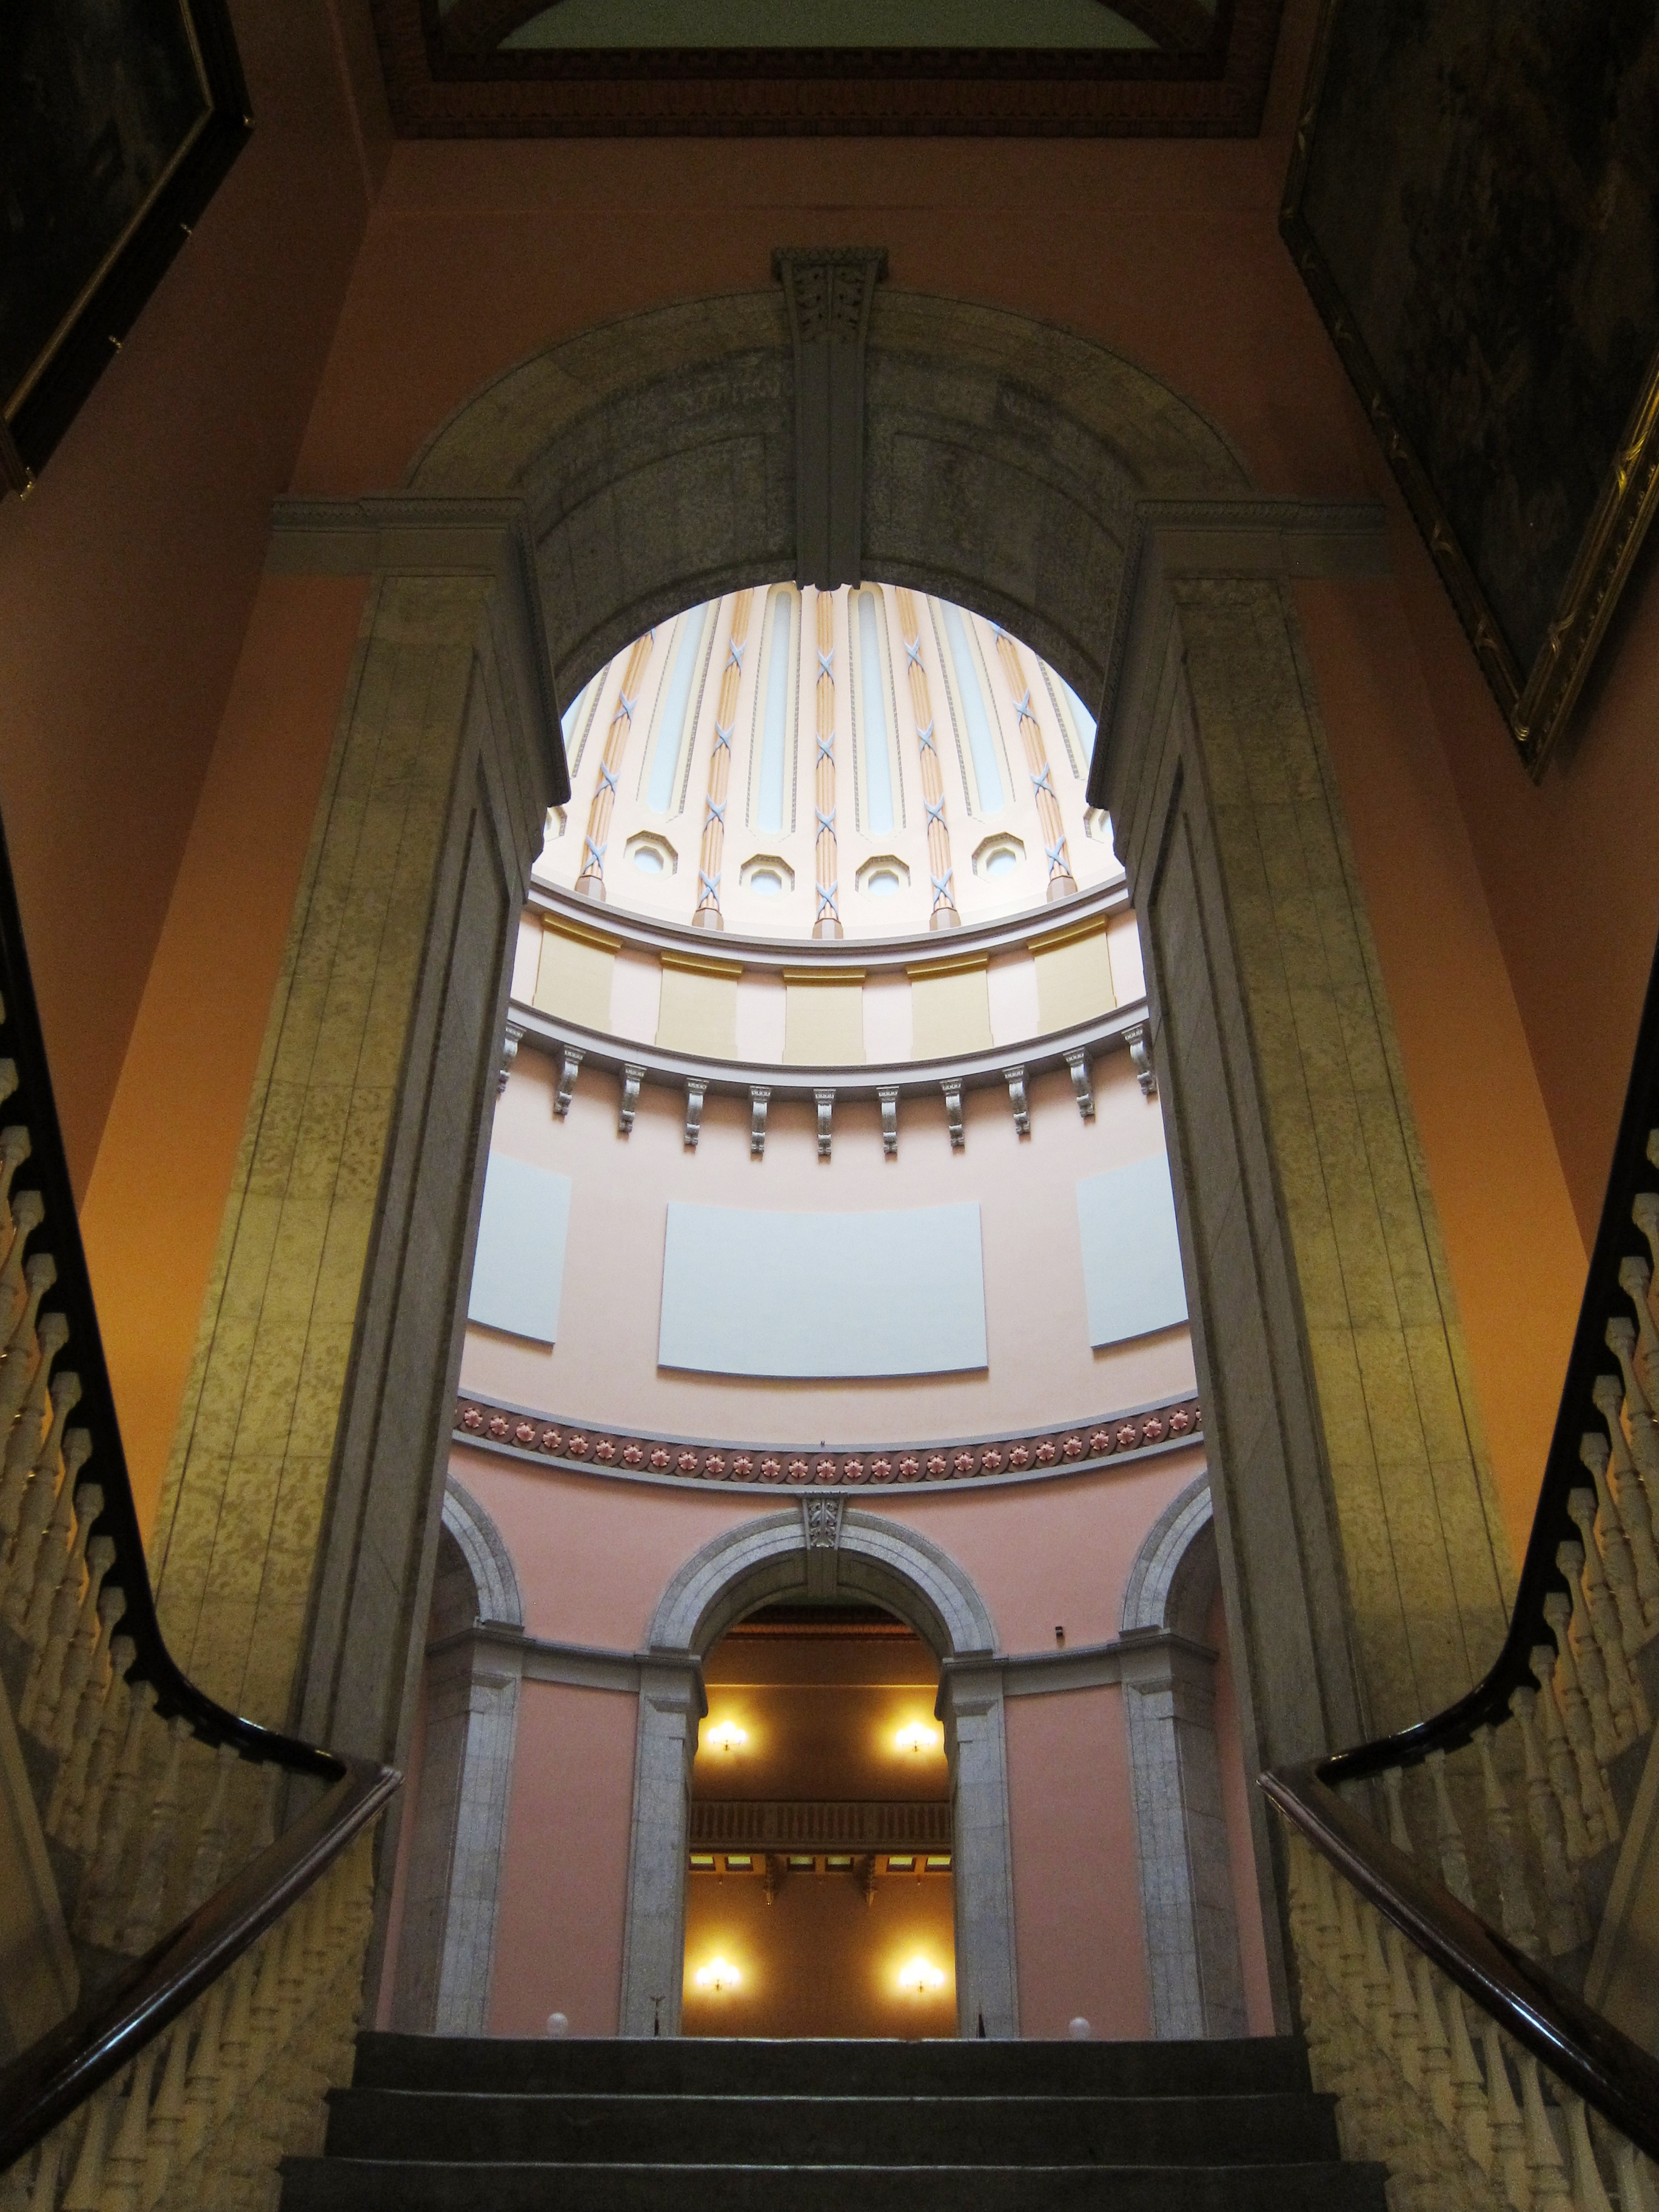 FileOhio Statehouse Columbus Ohio  view of rotunda